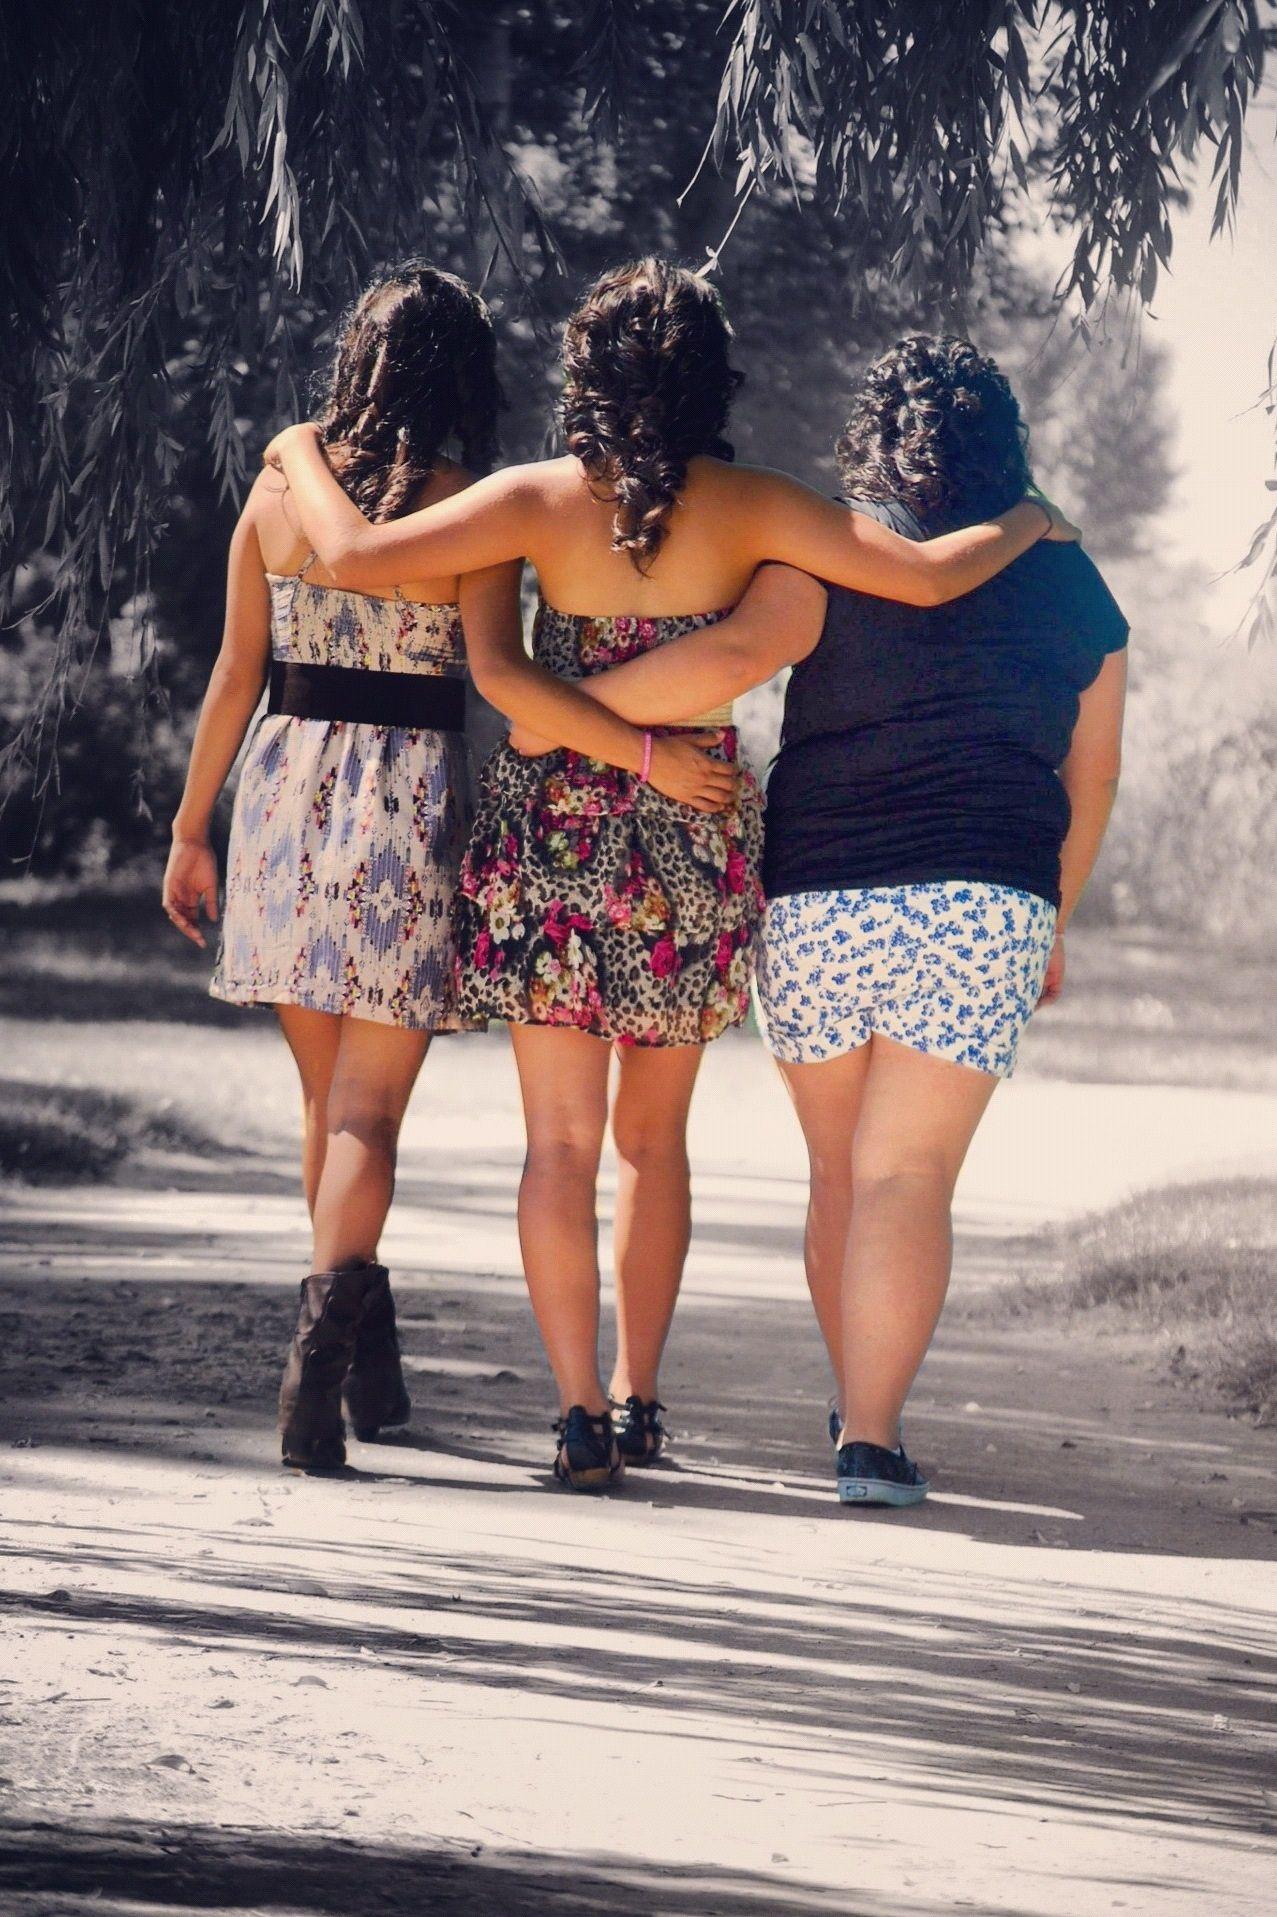 Three Best-friends! Senior Pic | Senior Photo-shoot ...